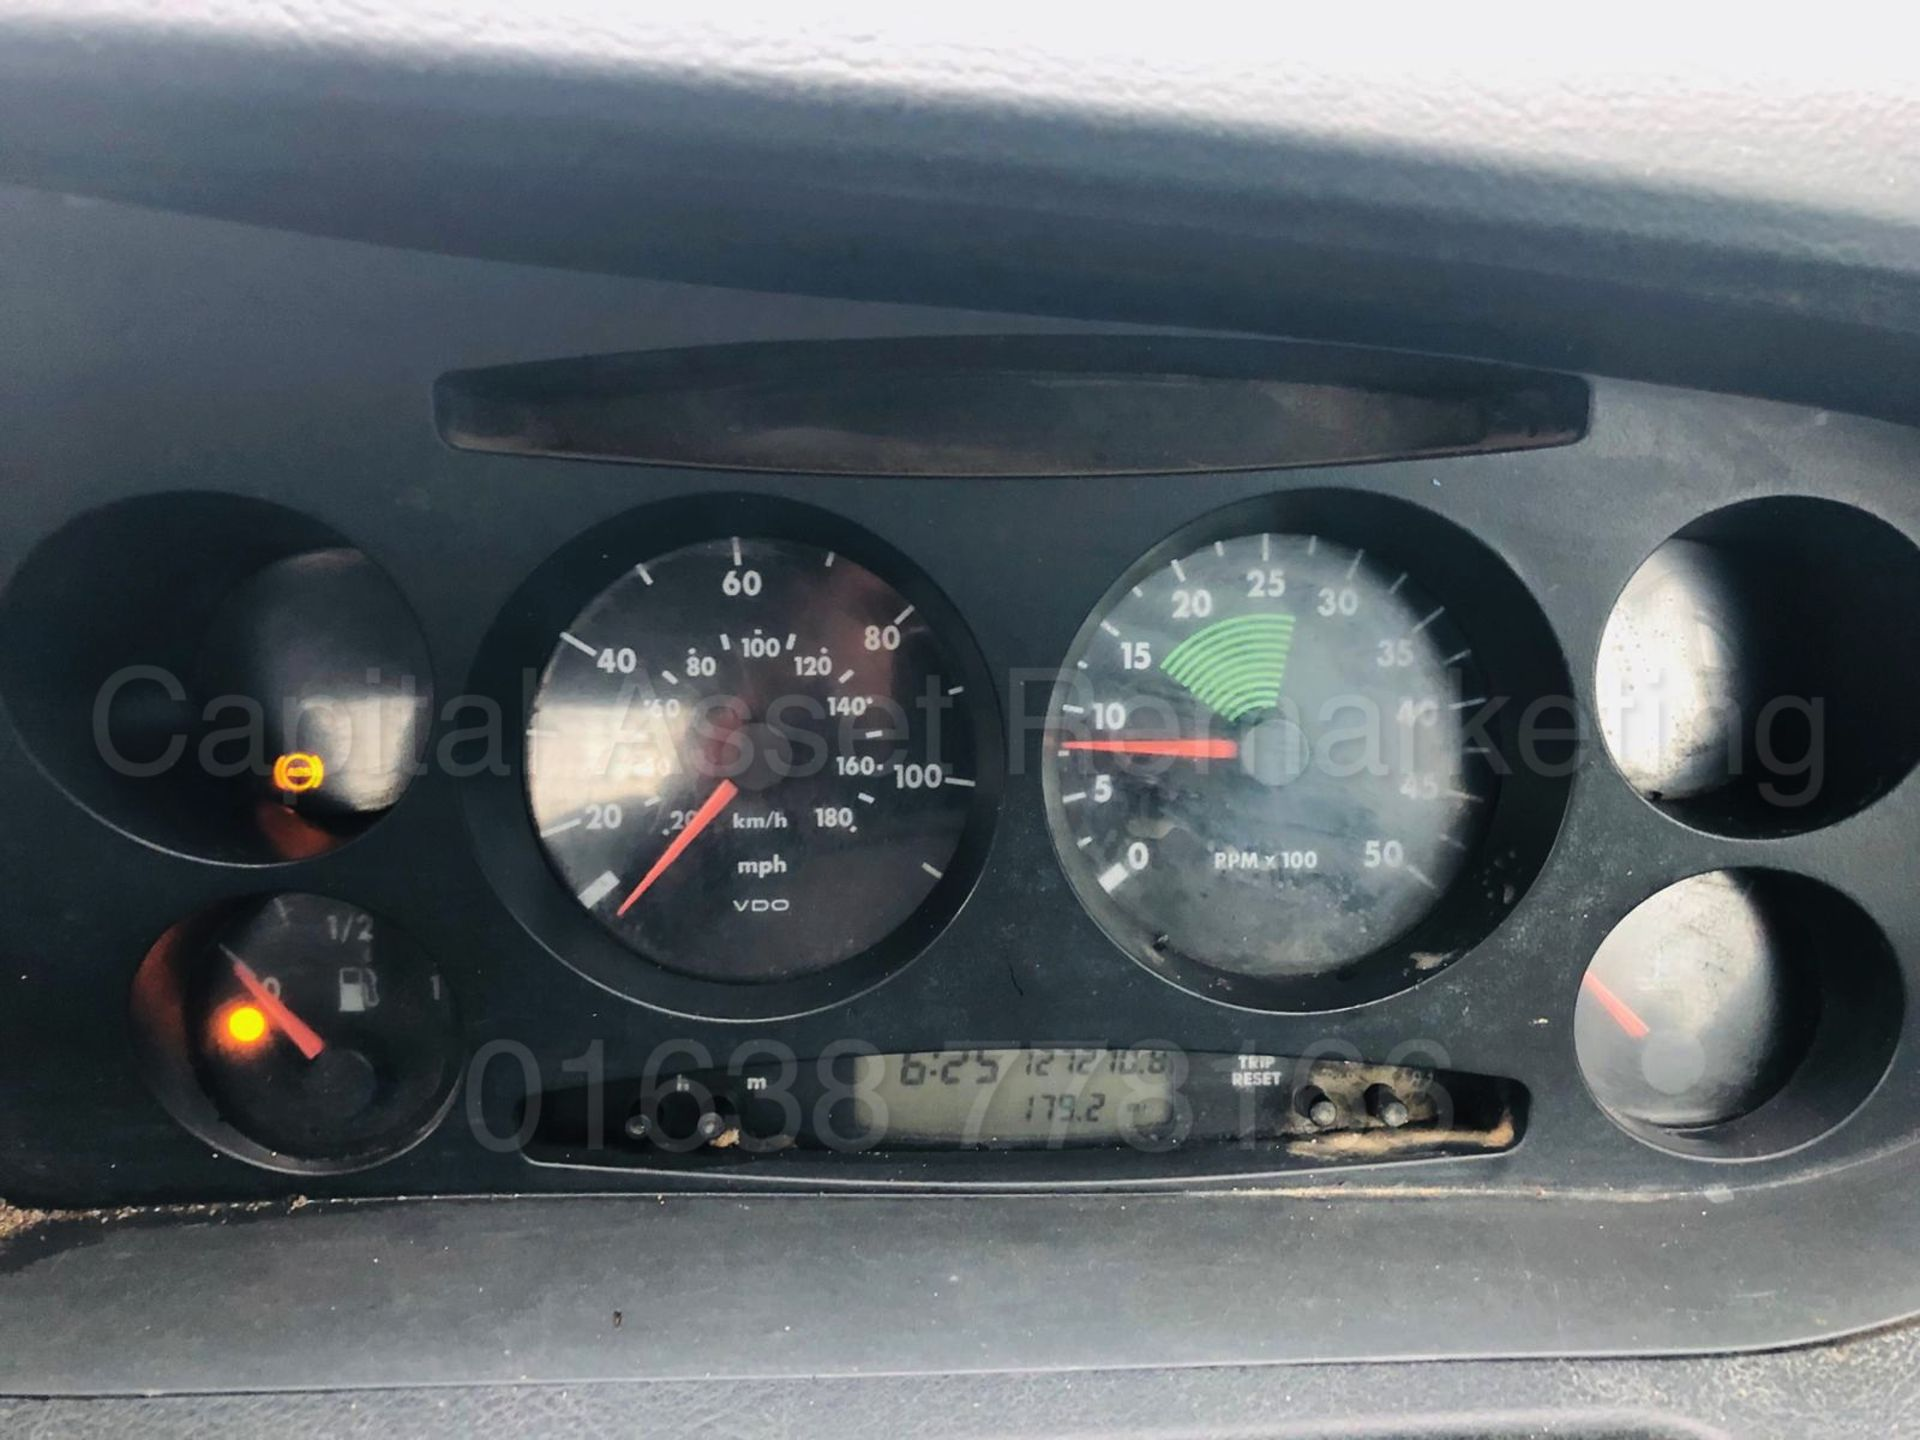 Lot 29 - IVECO DAILY 35C12 *LCV - TIPPER TRUCK* (2005) '2.3 DIESEL - 115 BHP - 5 SPEED' **3500 KG** (NO VAT)